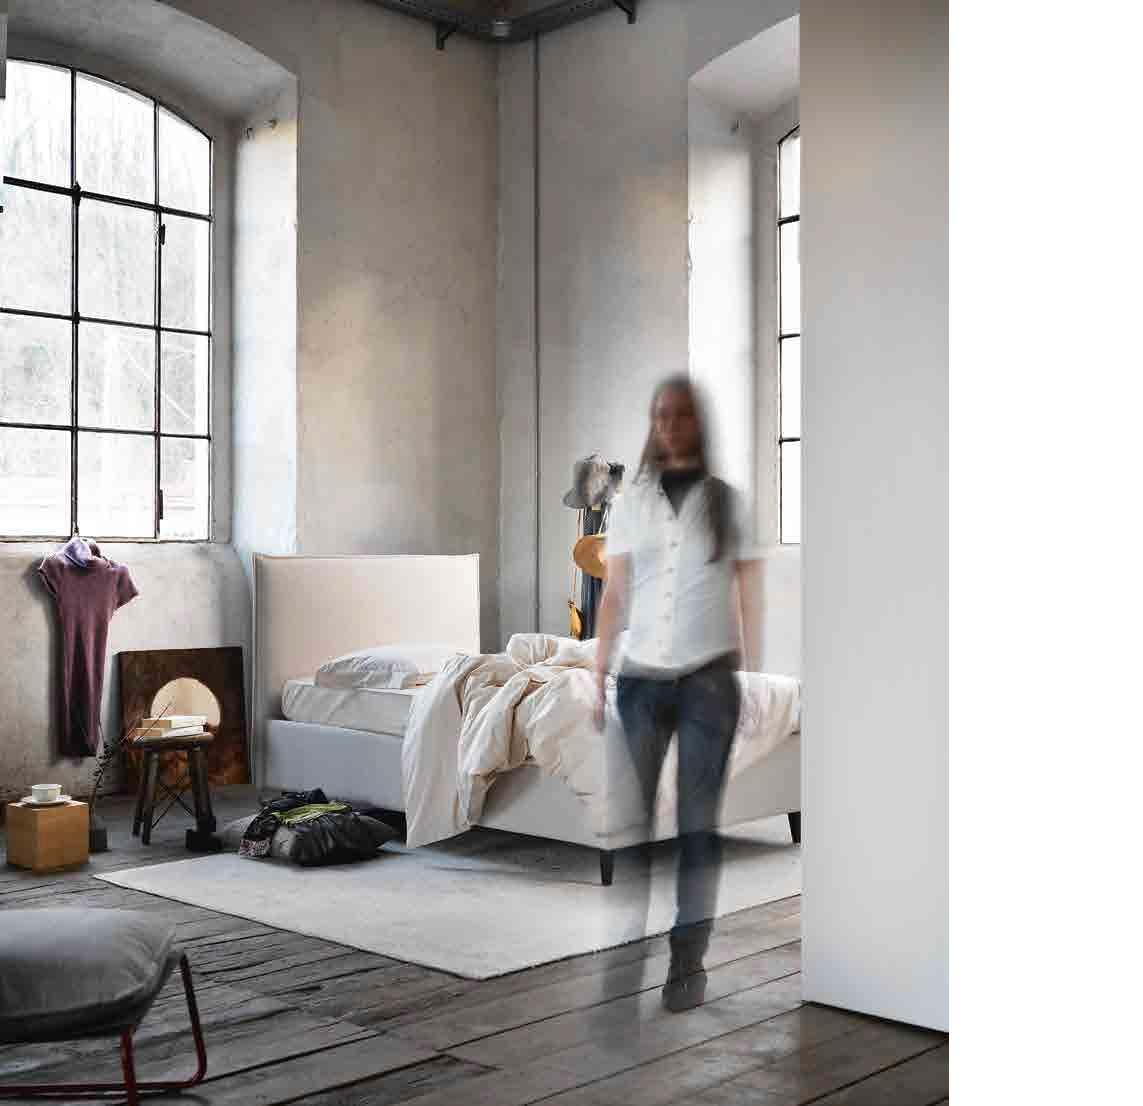 cabeceros-tapizados-general-muebles-paco-caballero-1811-5cdfdfb7e4813